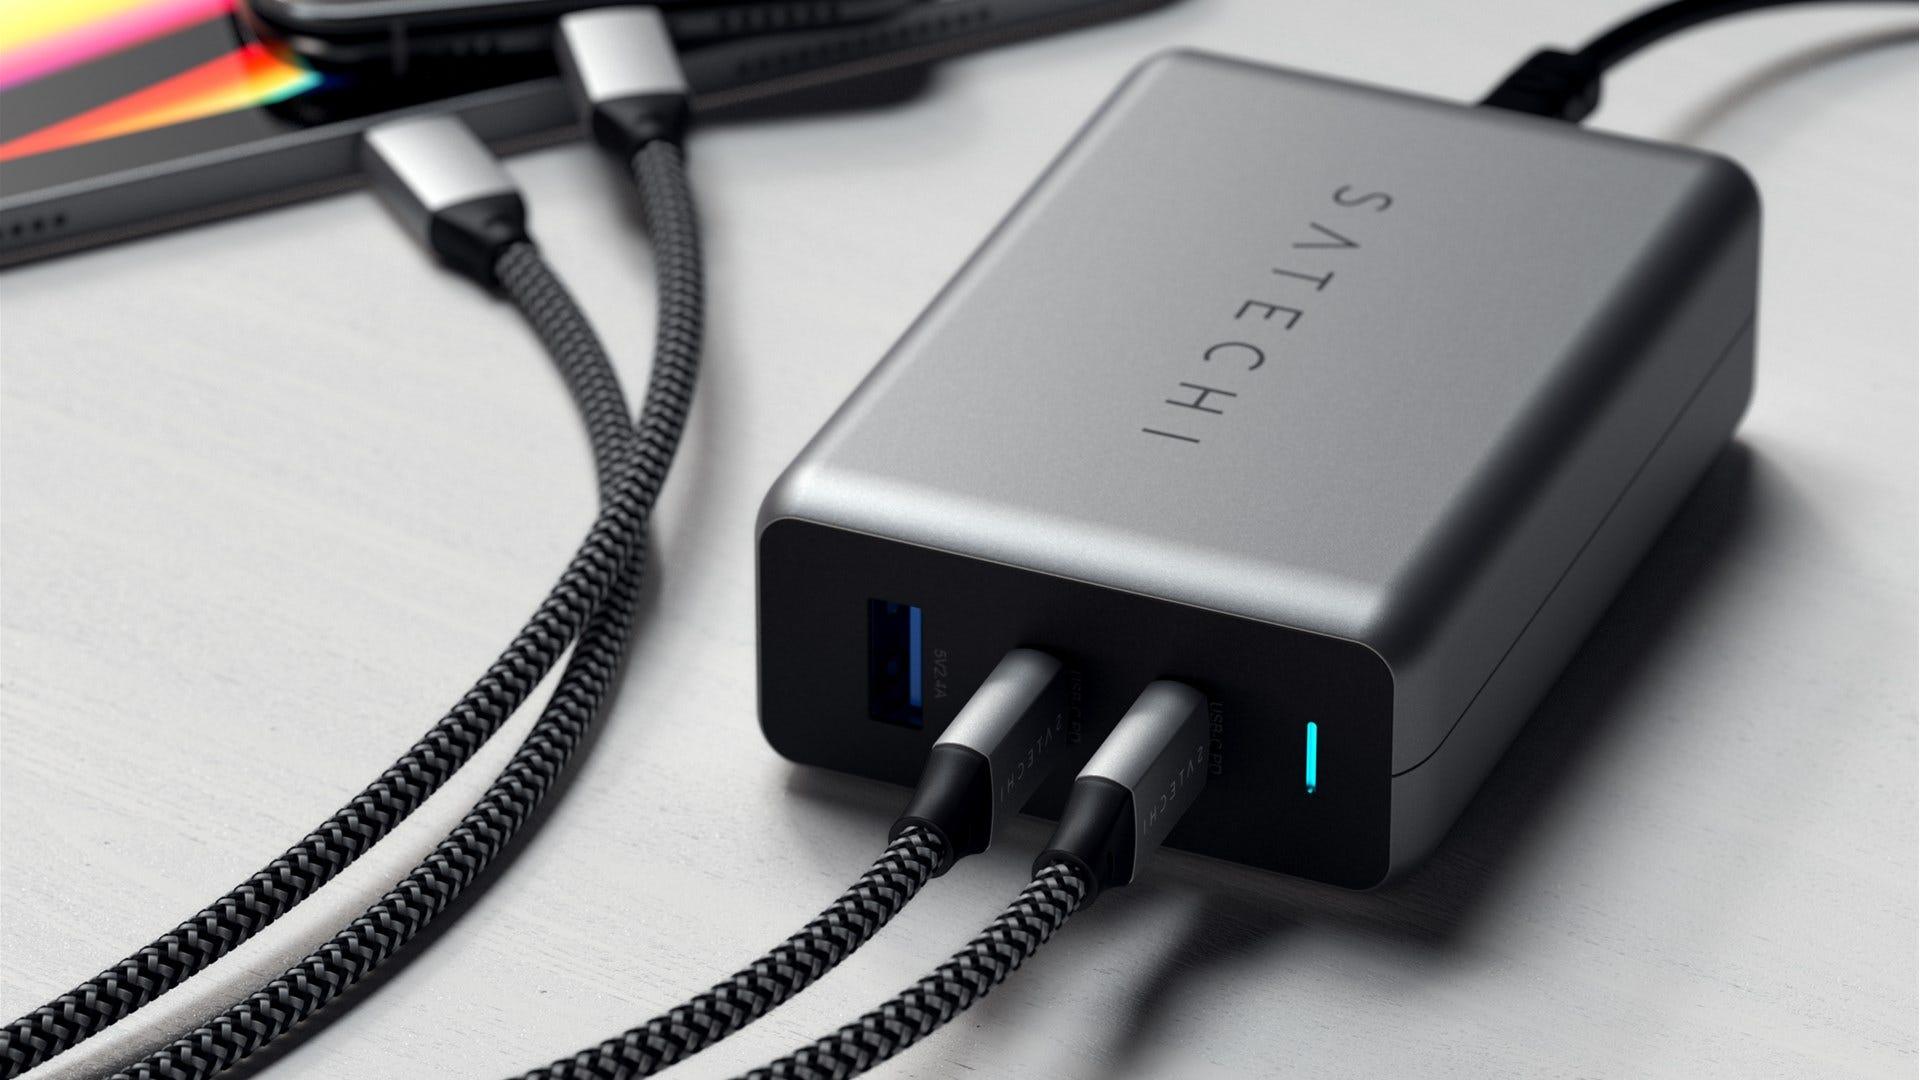 Satechi 100W dual USB-C PD GaN charger ports